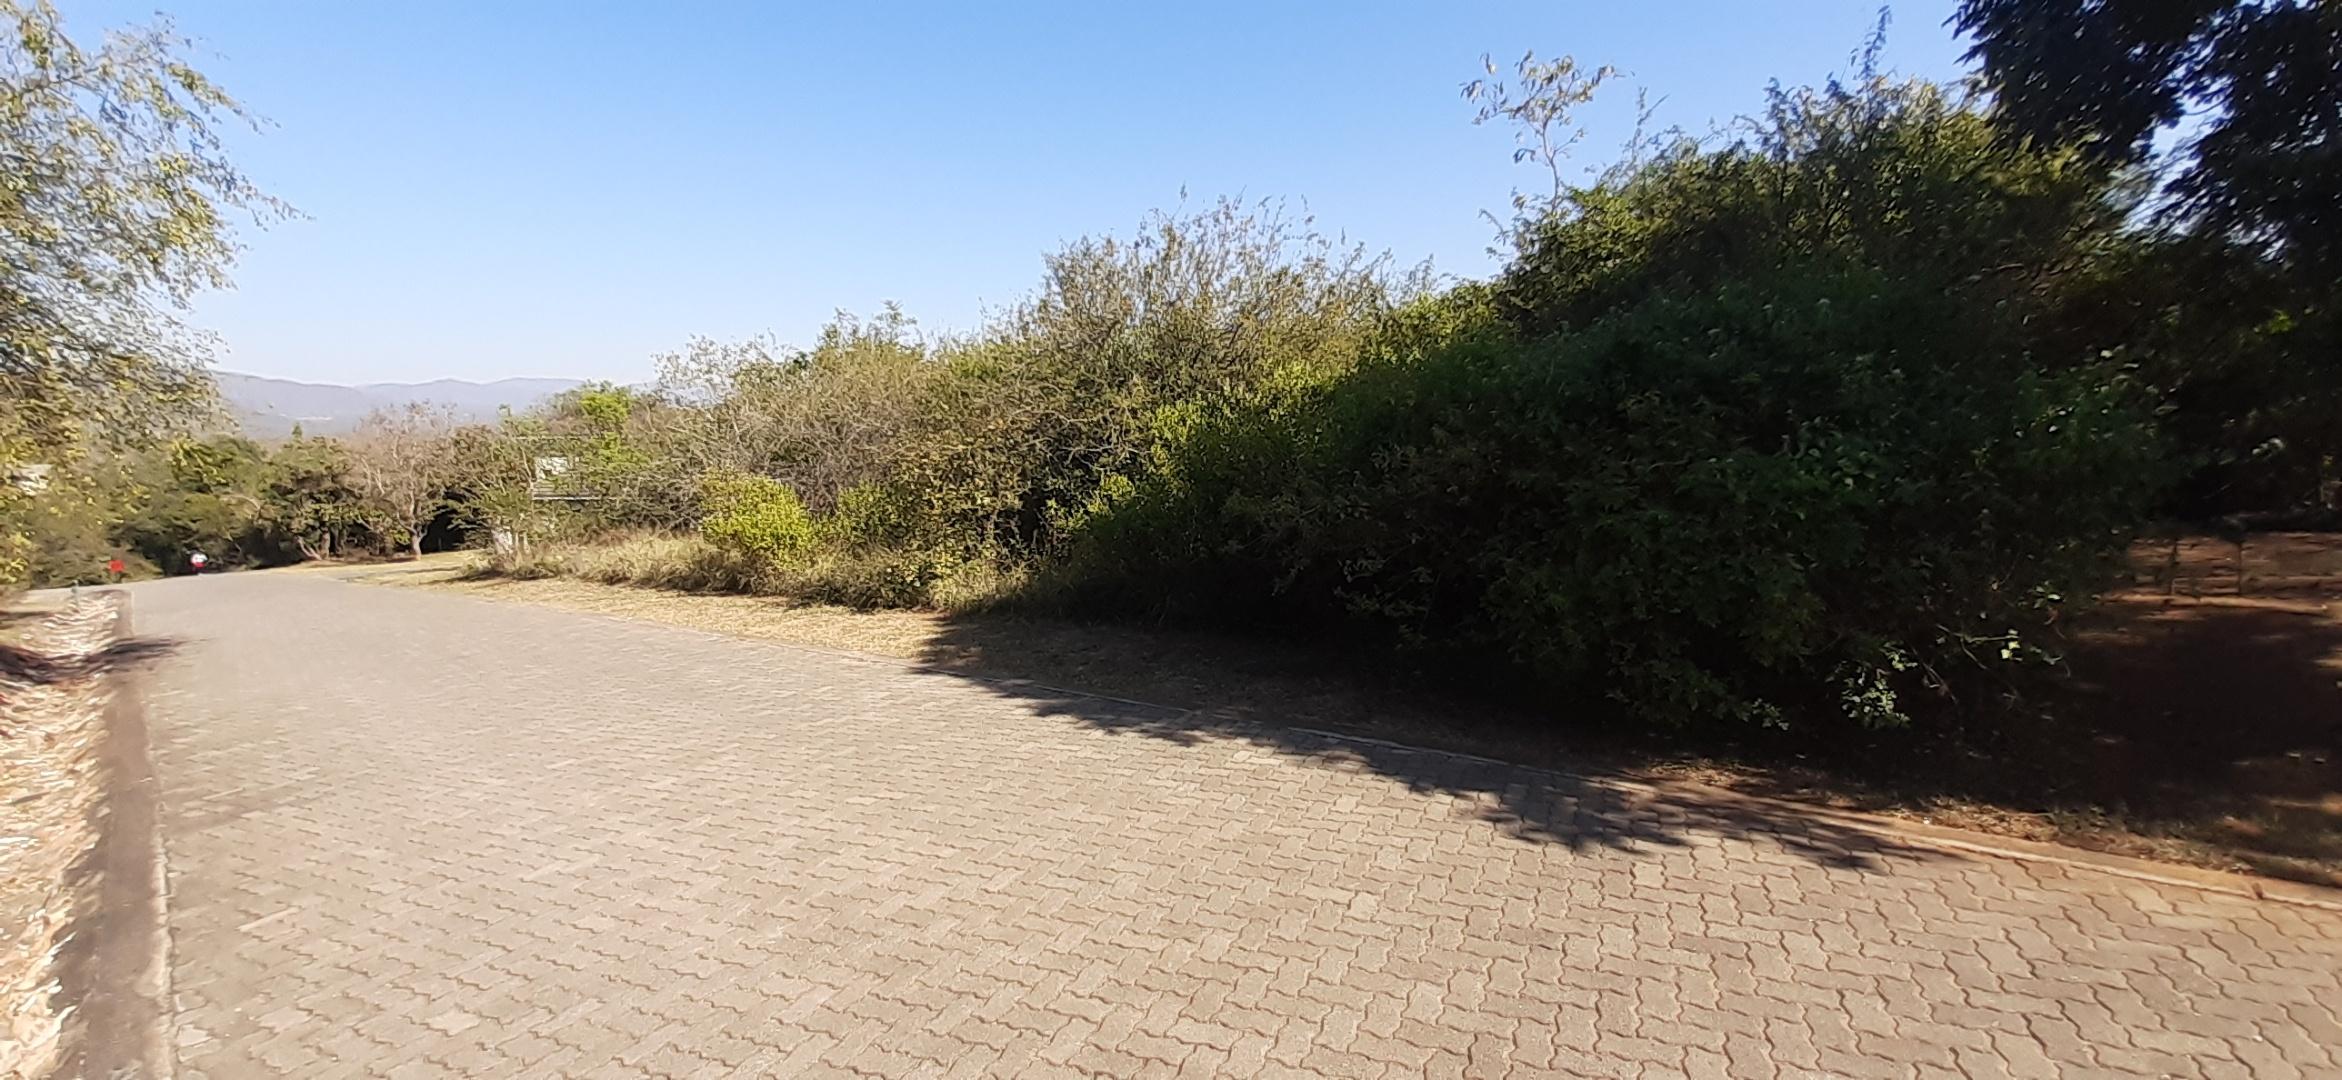 Vacant Land / Plot in Sidvokodvo For Sale